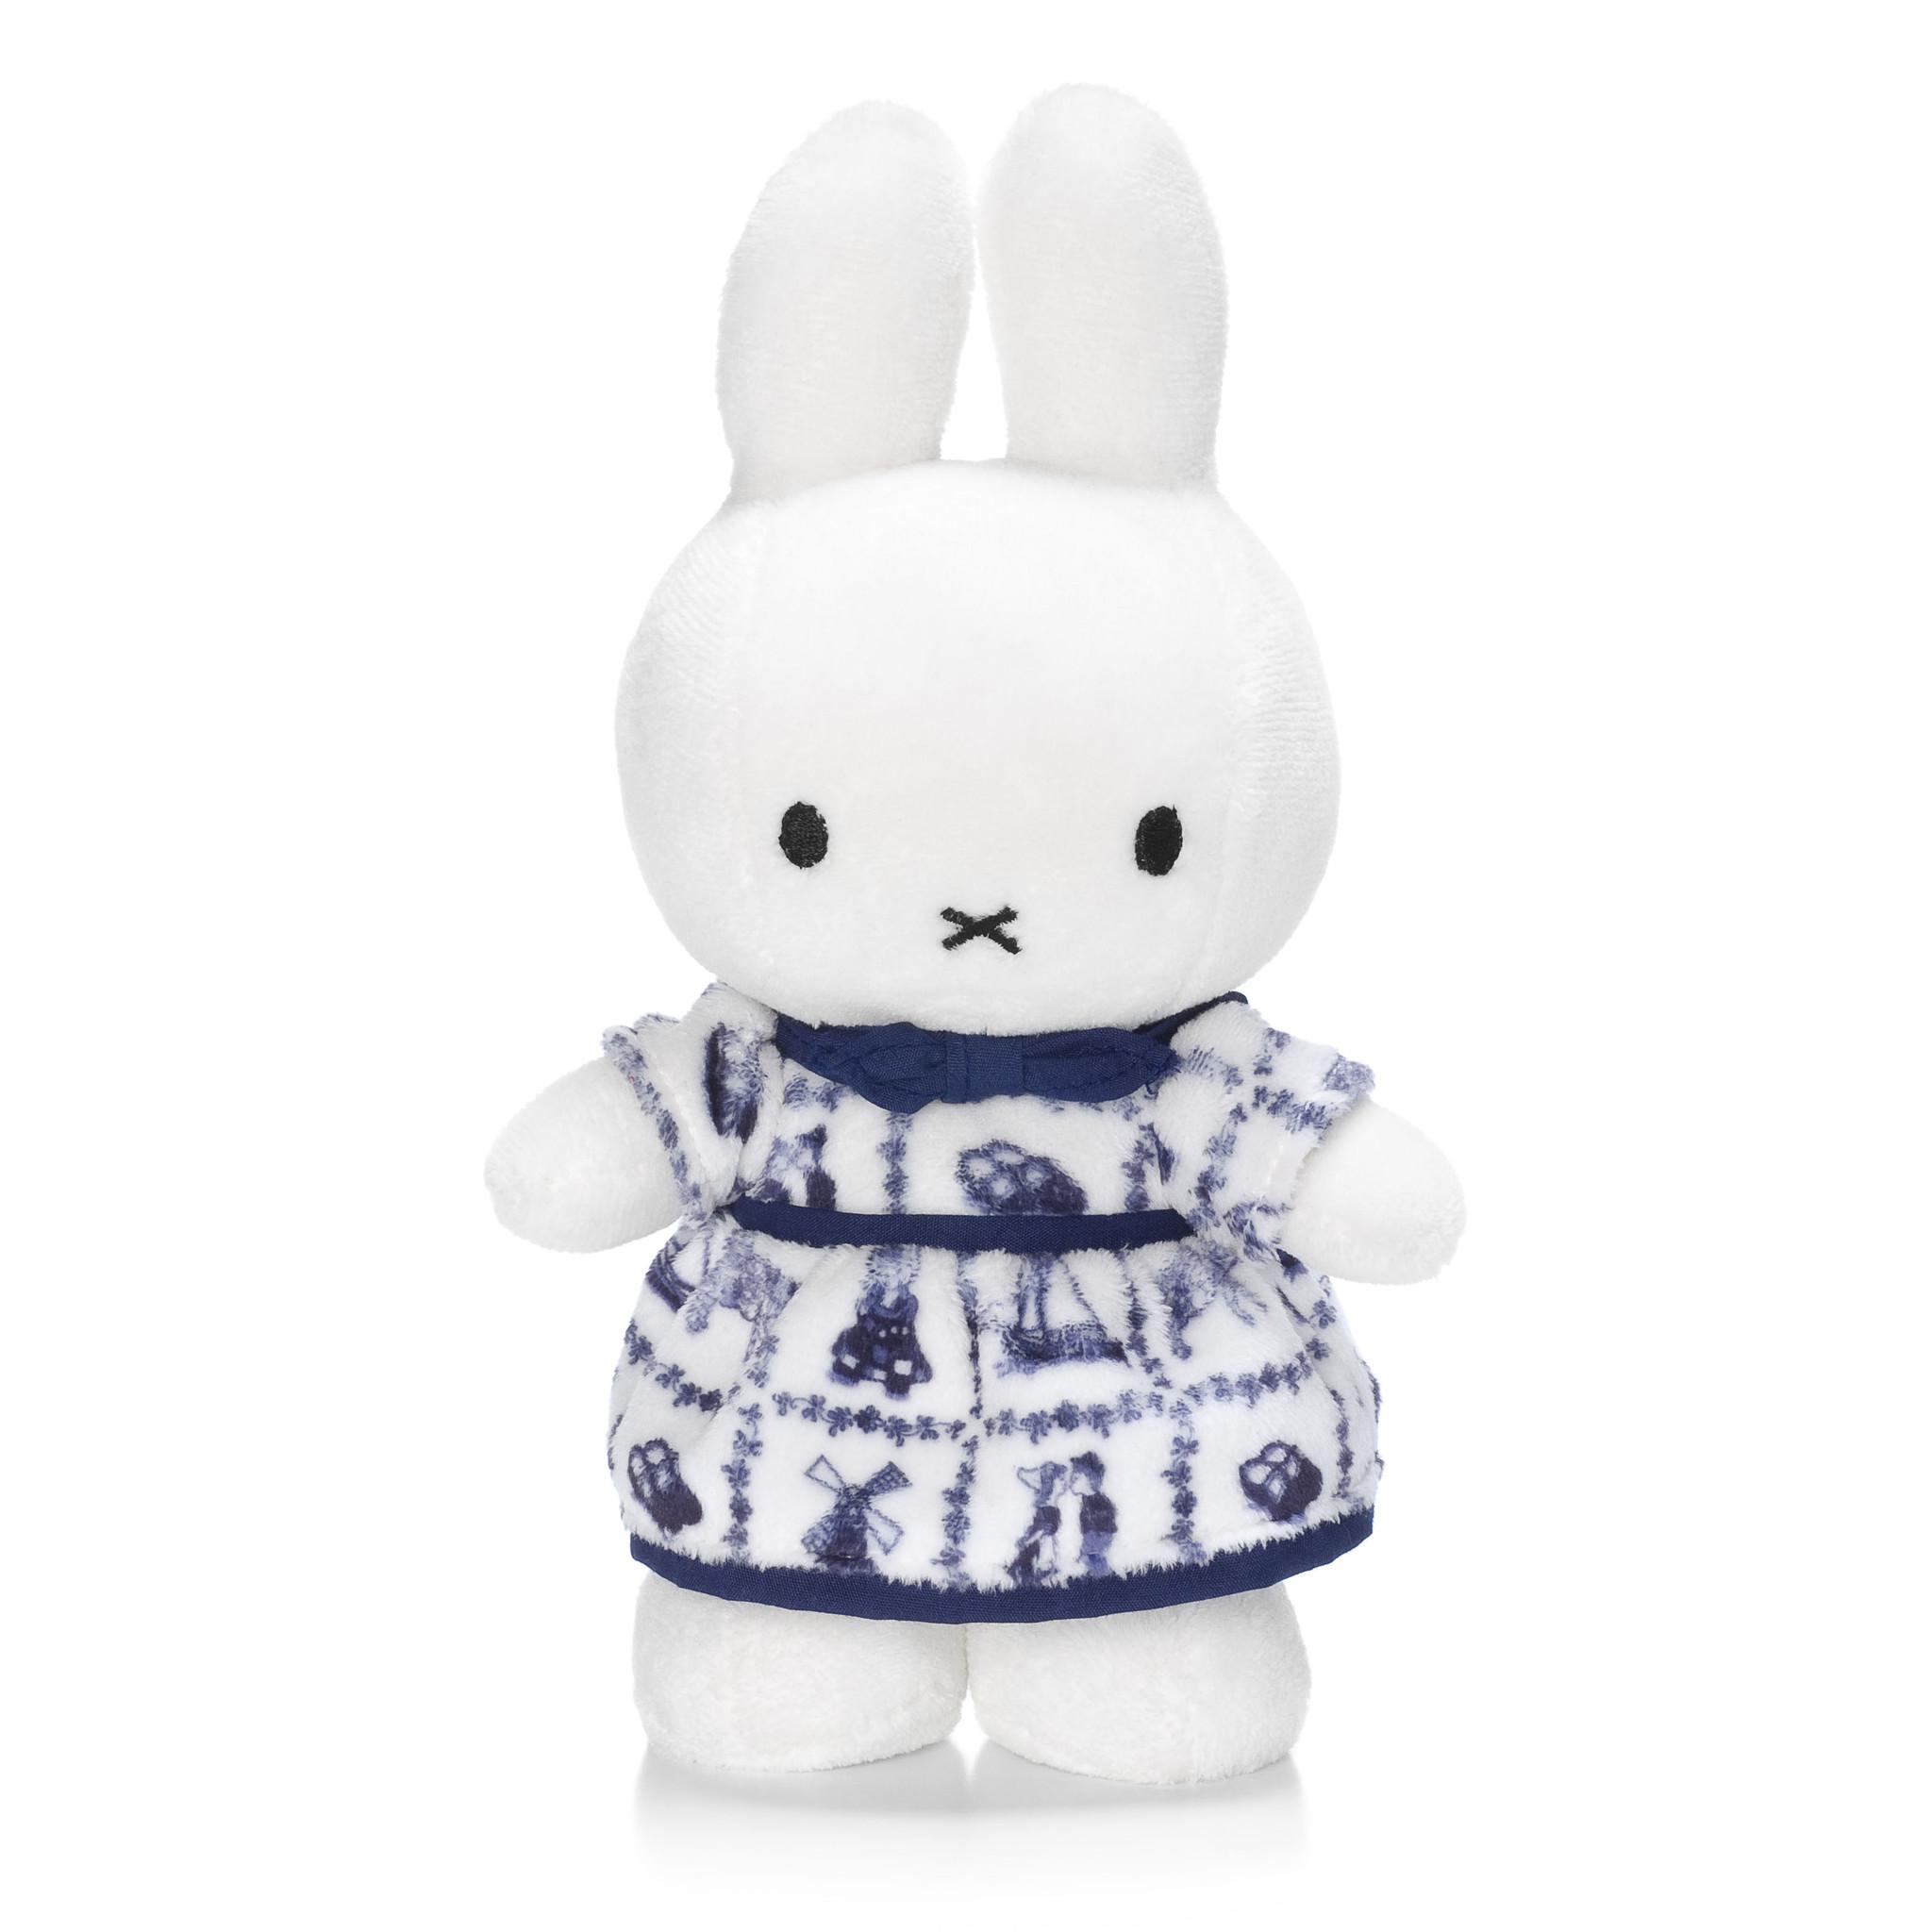 Nijntje/Miffy Miffy delft blue dress -  24 cm